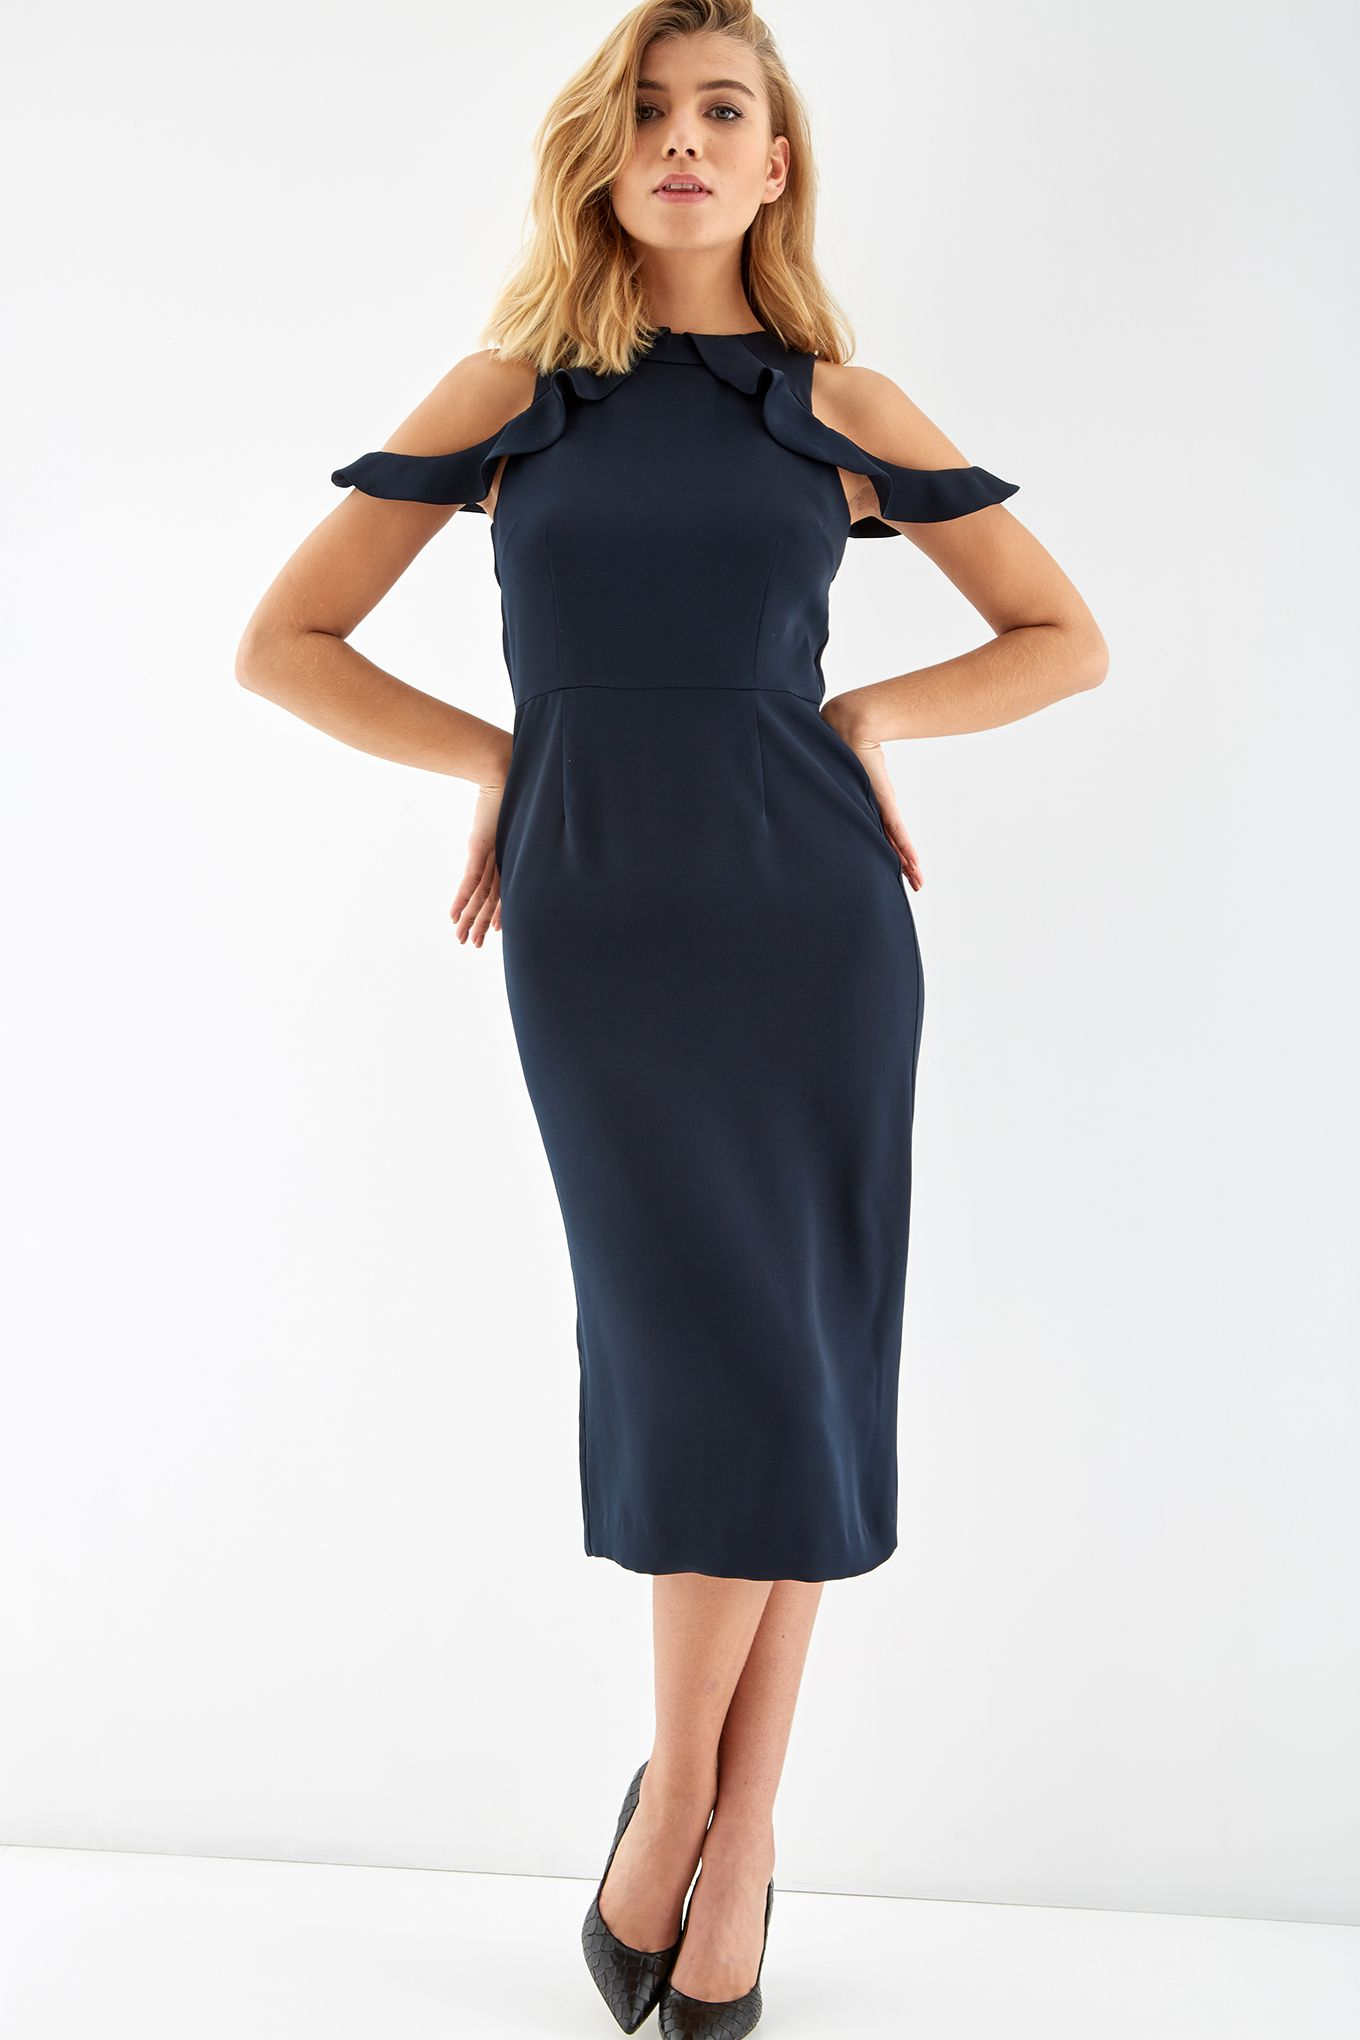 Women s Off the Shoulder Midi Dress